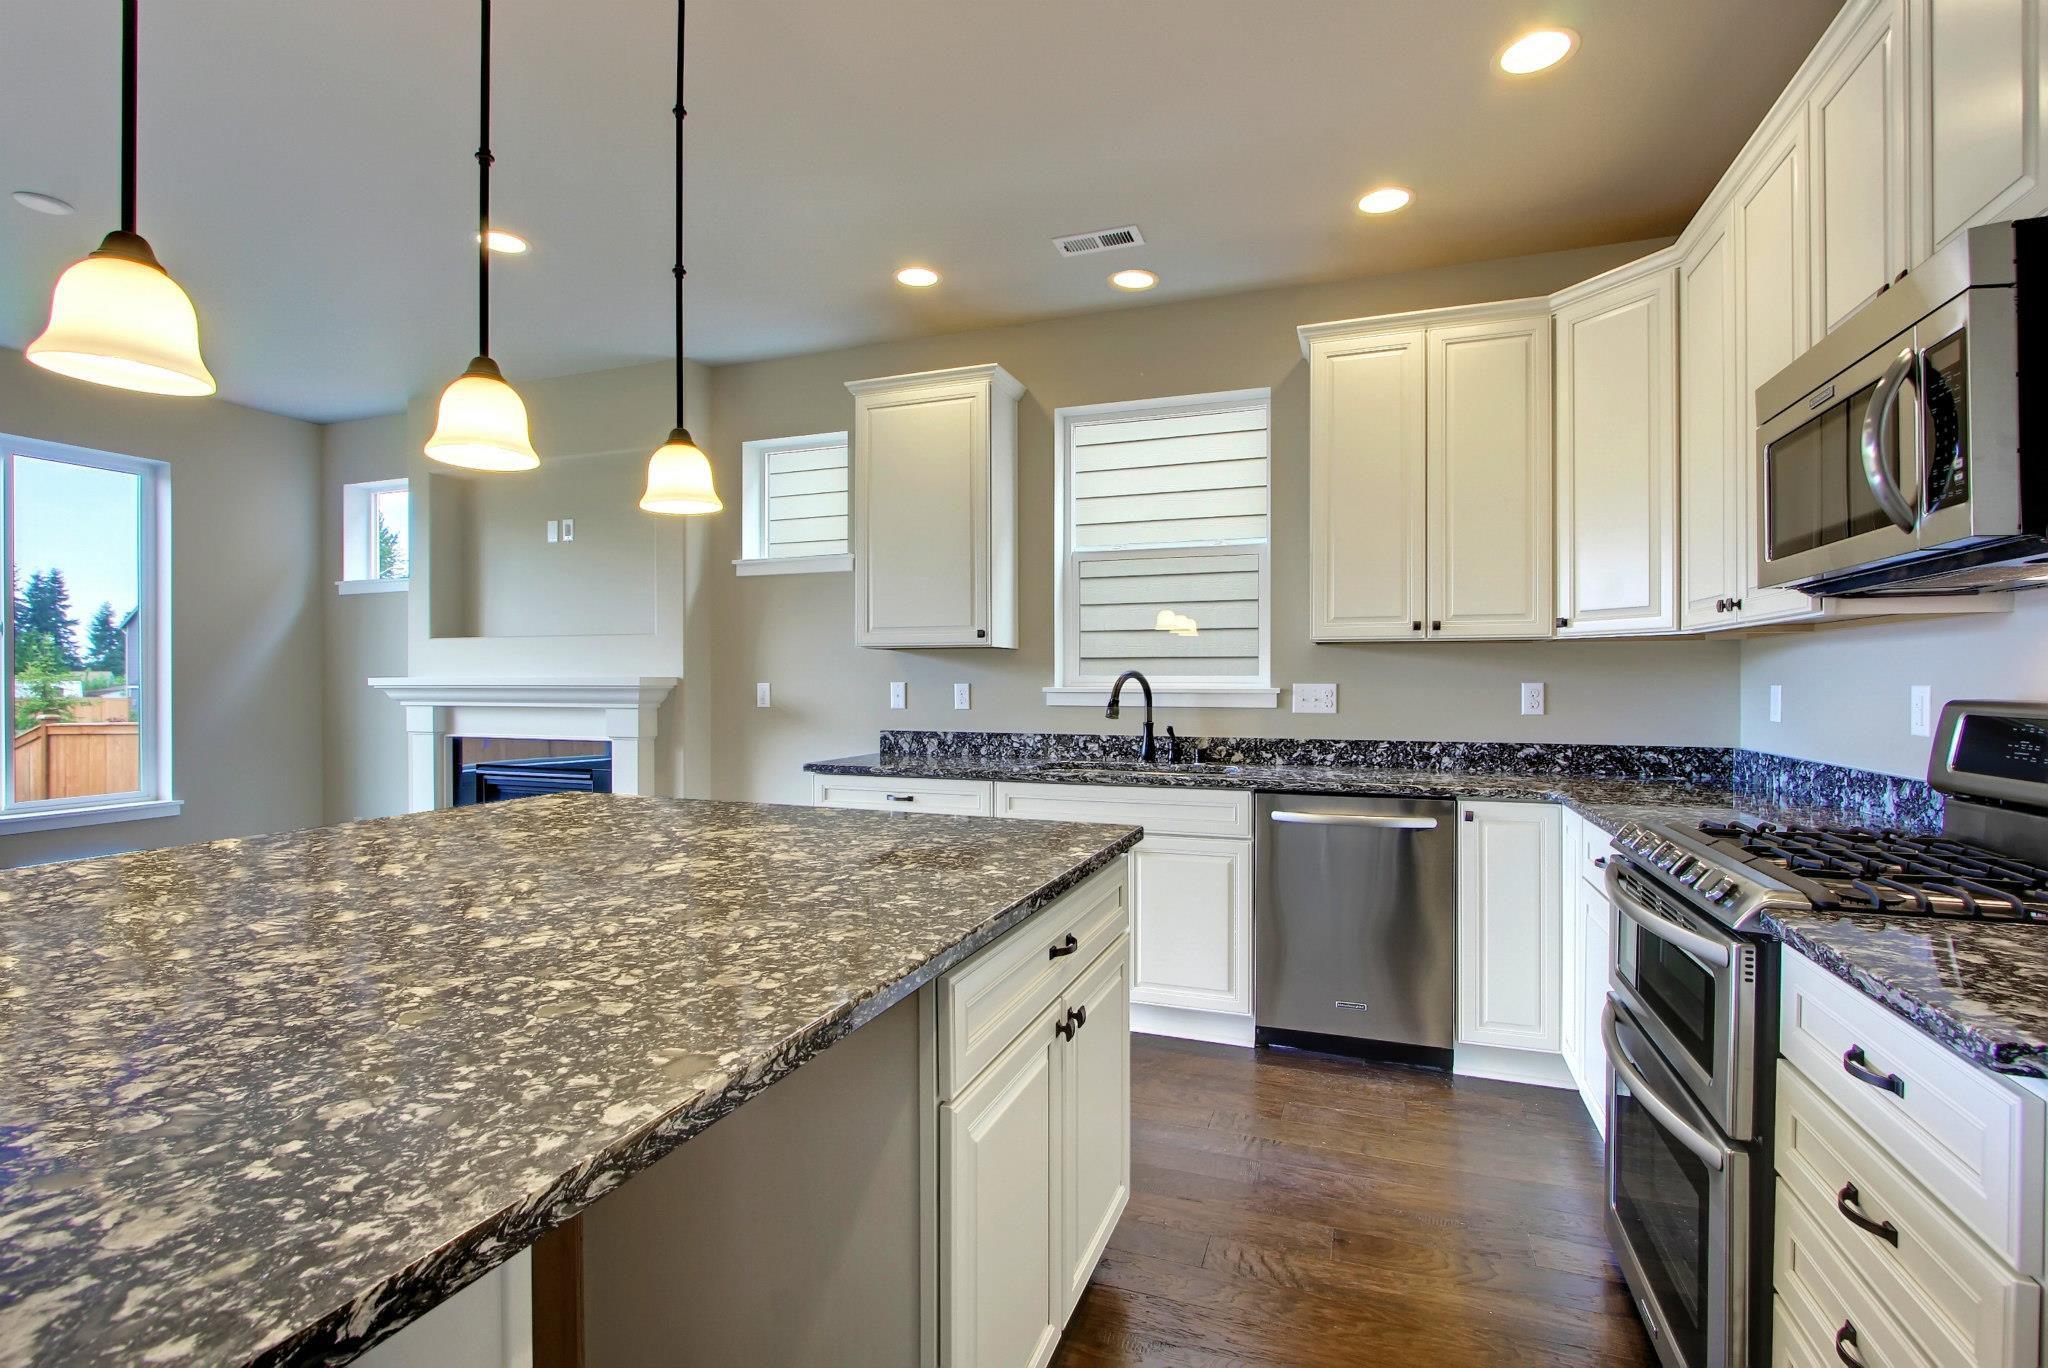 kitchen-white-cabinets-dark-countertops-photo-7